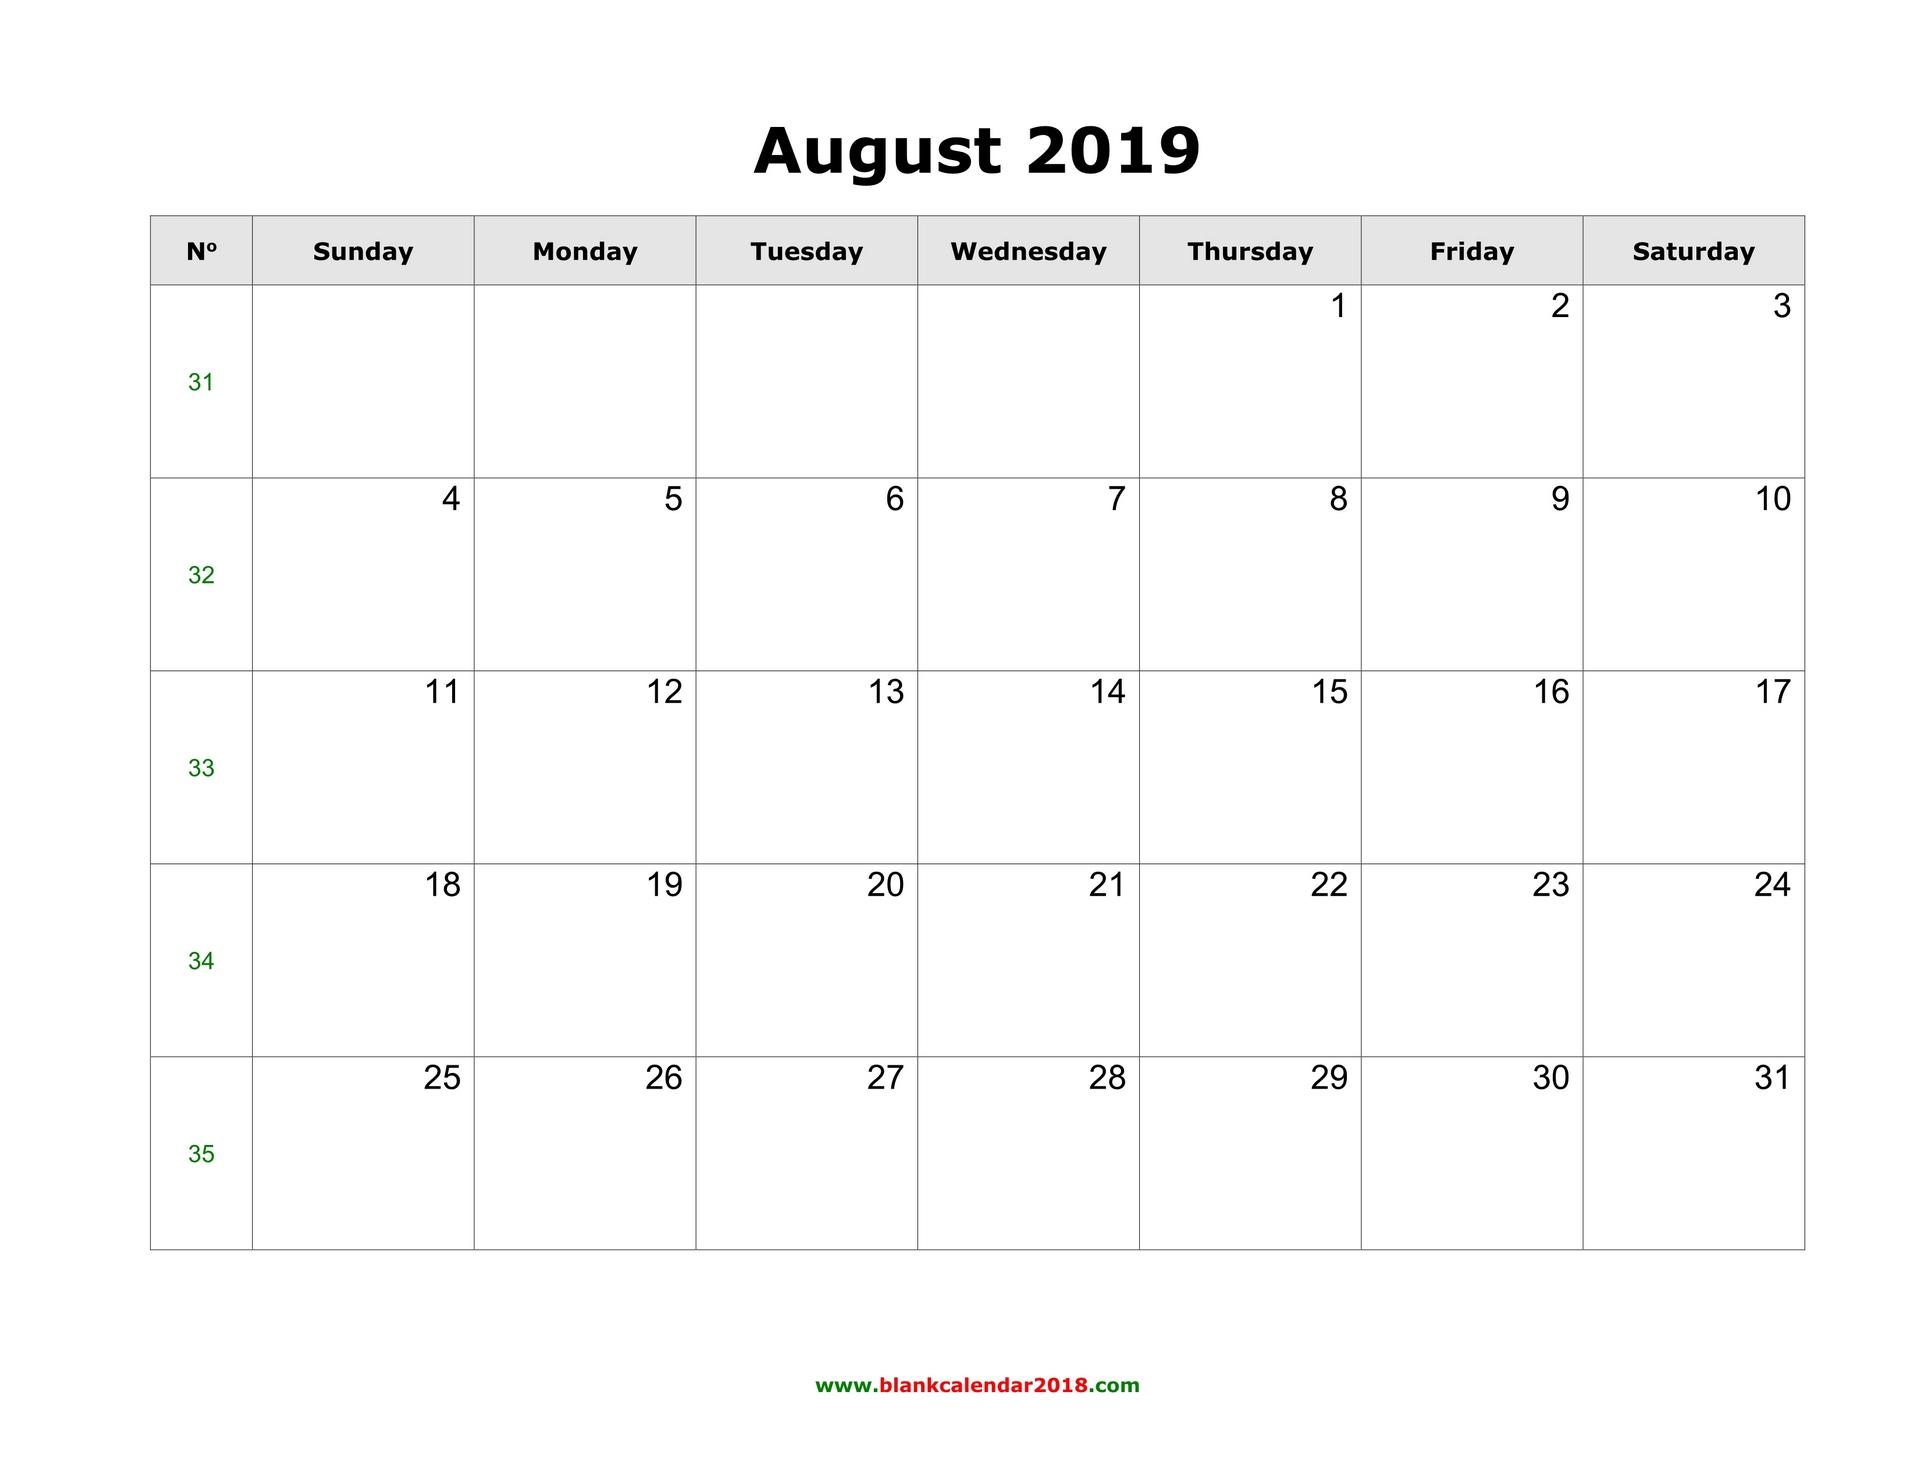 Blank Calendar For August 2019 for Blank Printable Calendar August